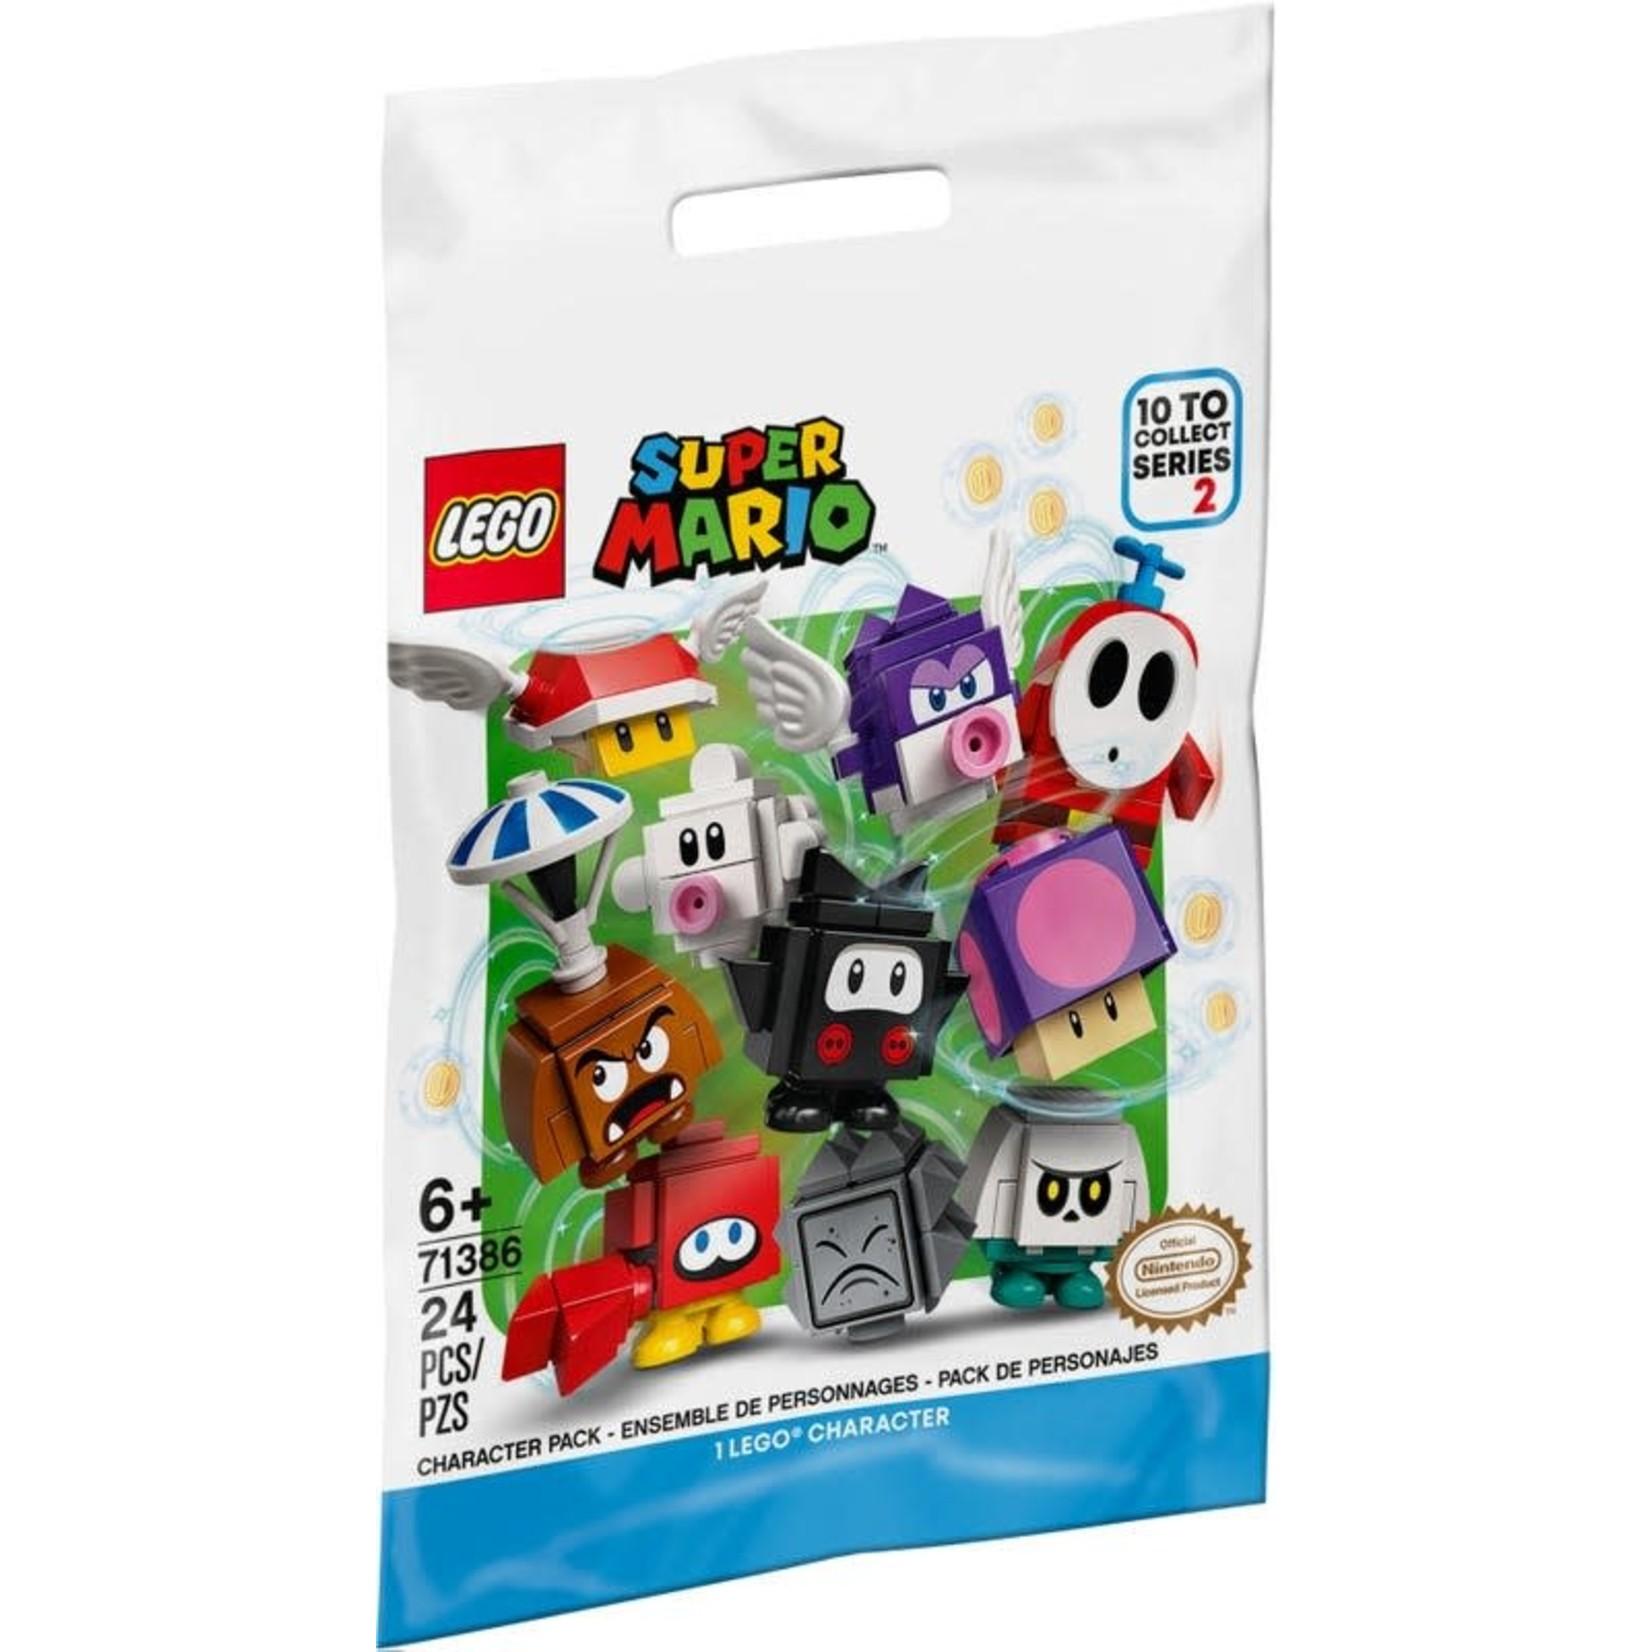 LEGO LEGO Minifigure Mario Character Pack Series 2